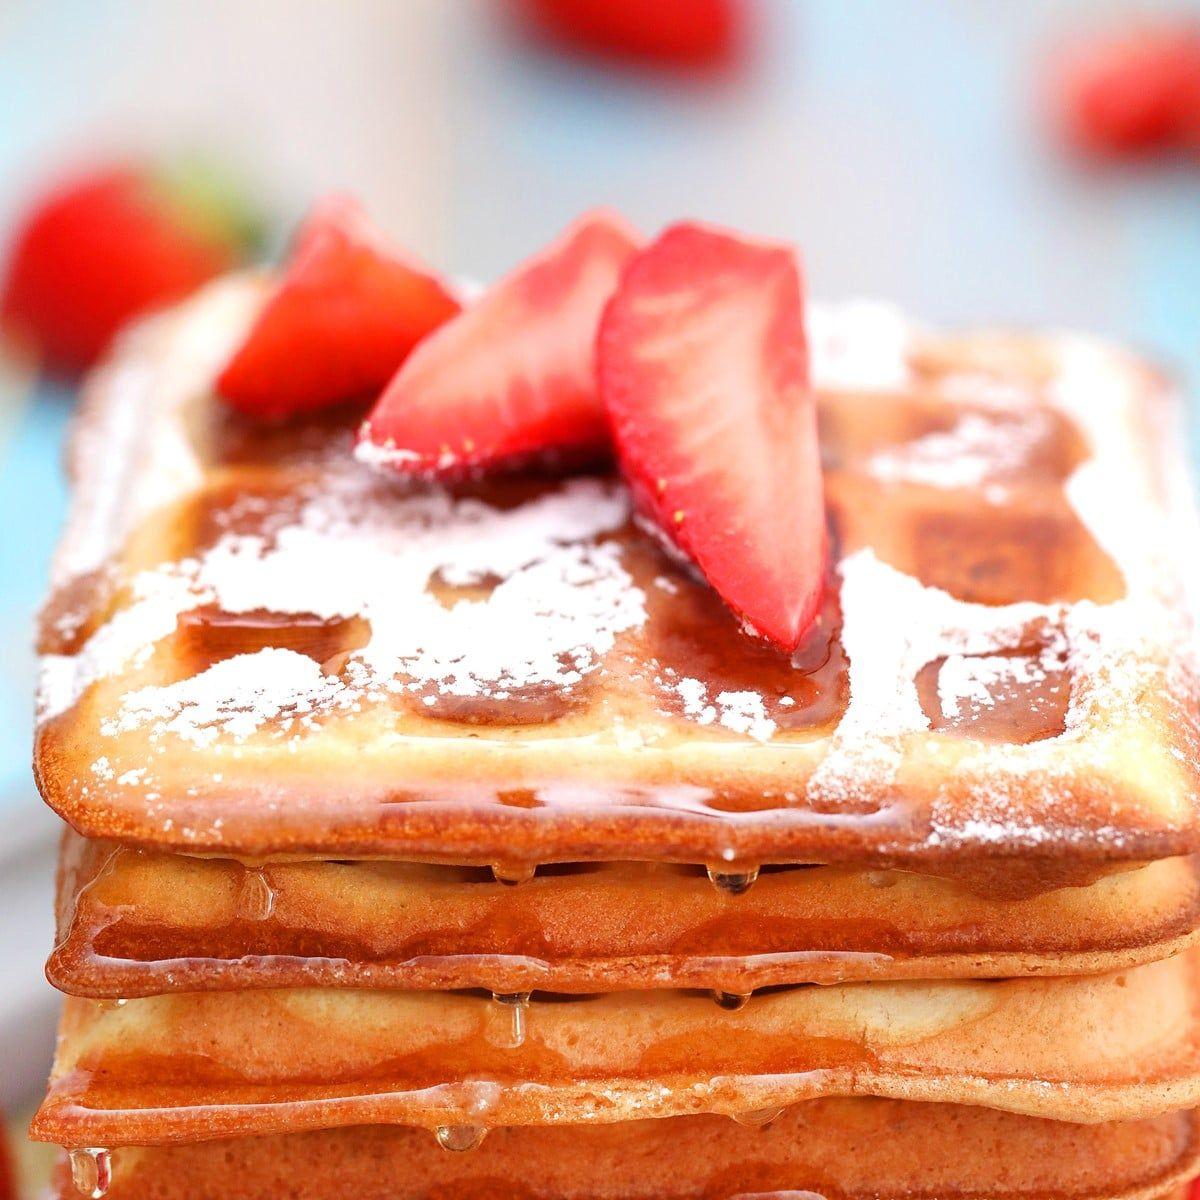 Tater Tot Breakfast Scramble